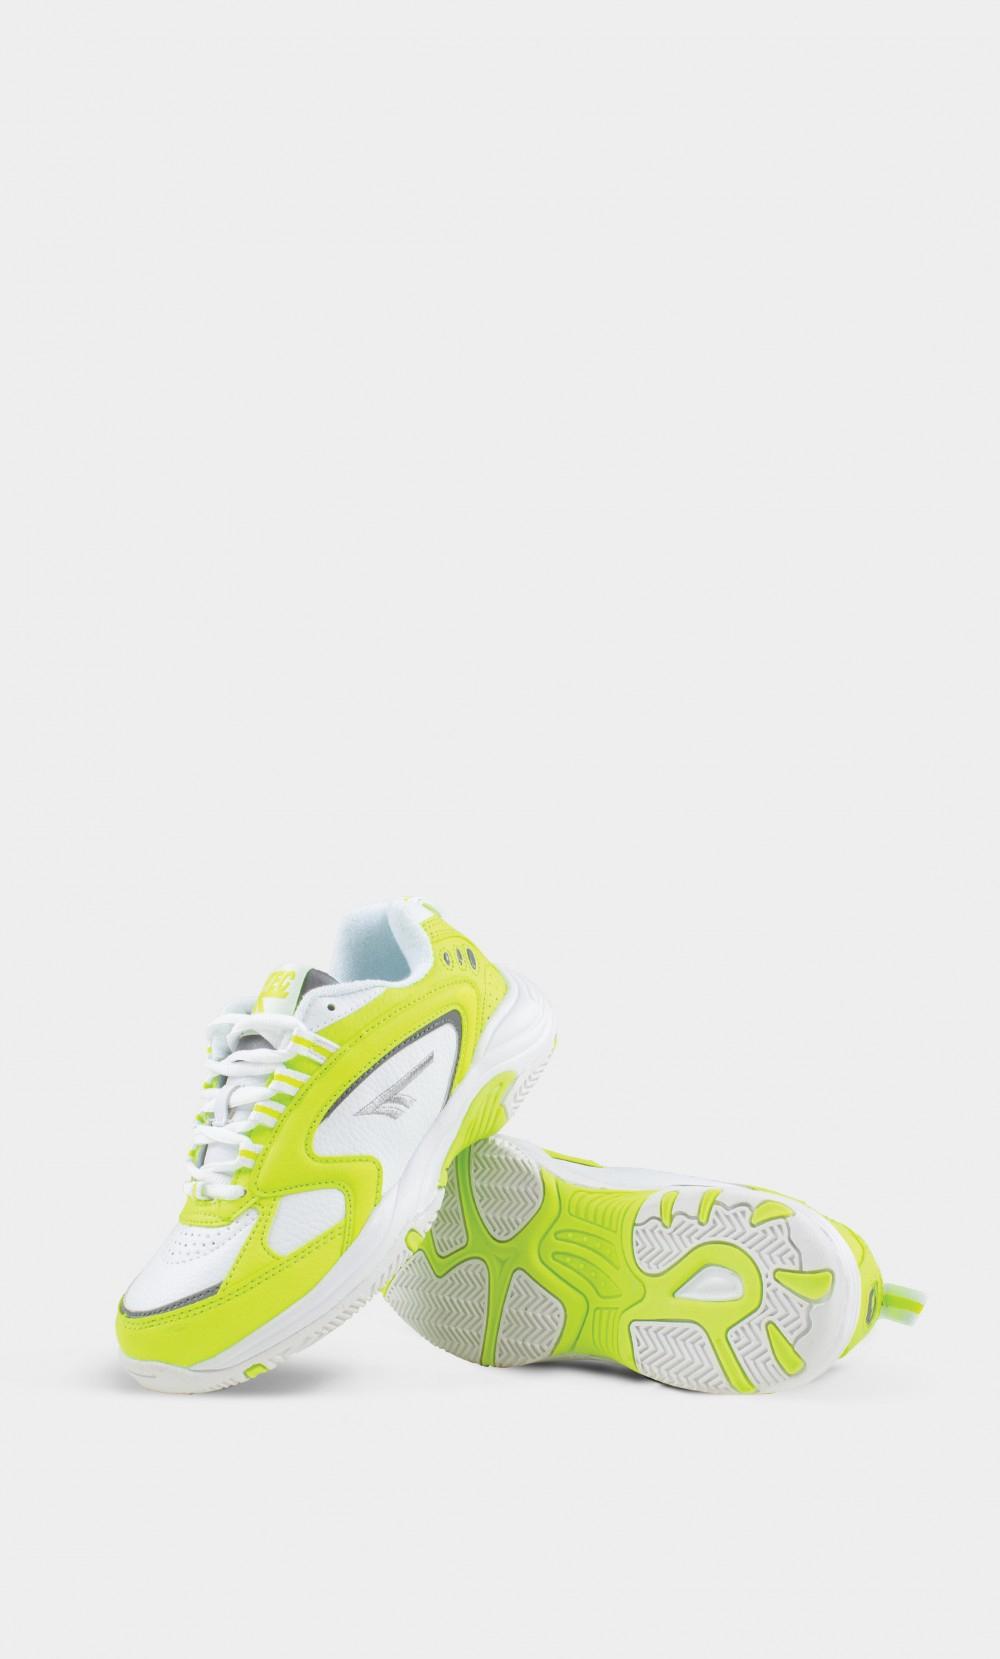 Image of   HI-TEC Hts Blast Sneakers, Neon Yellow / White